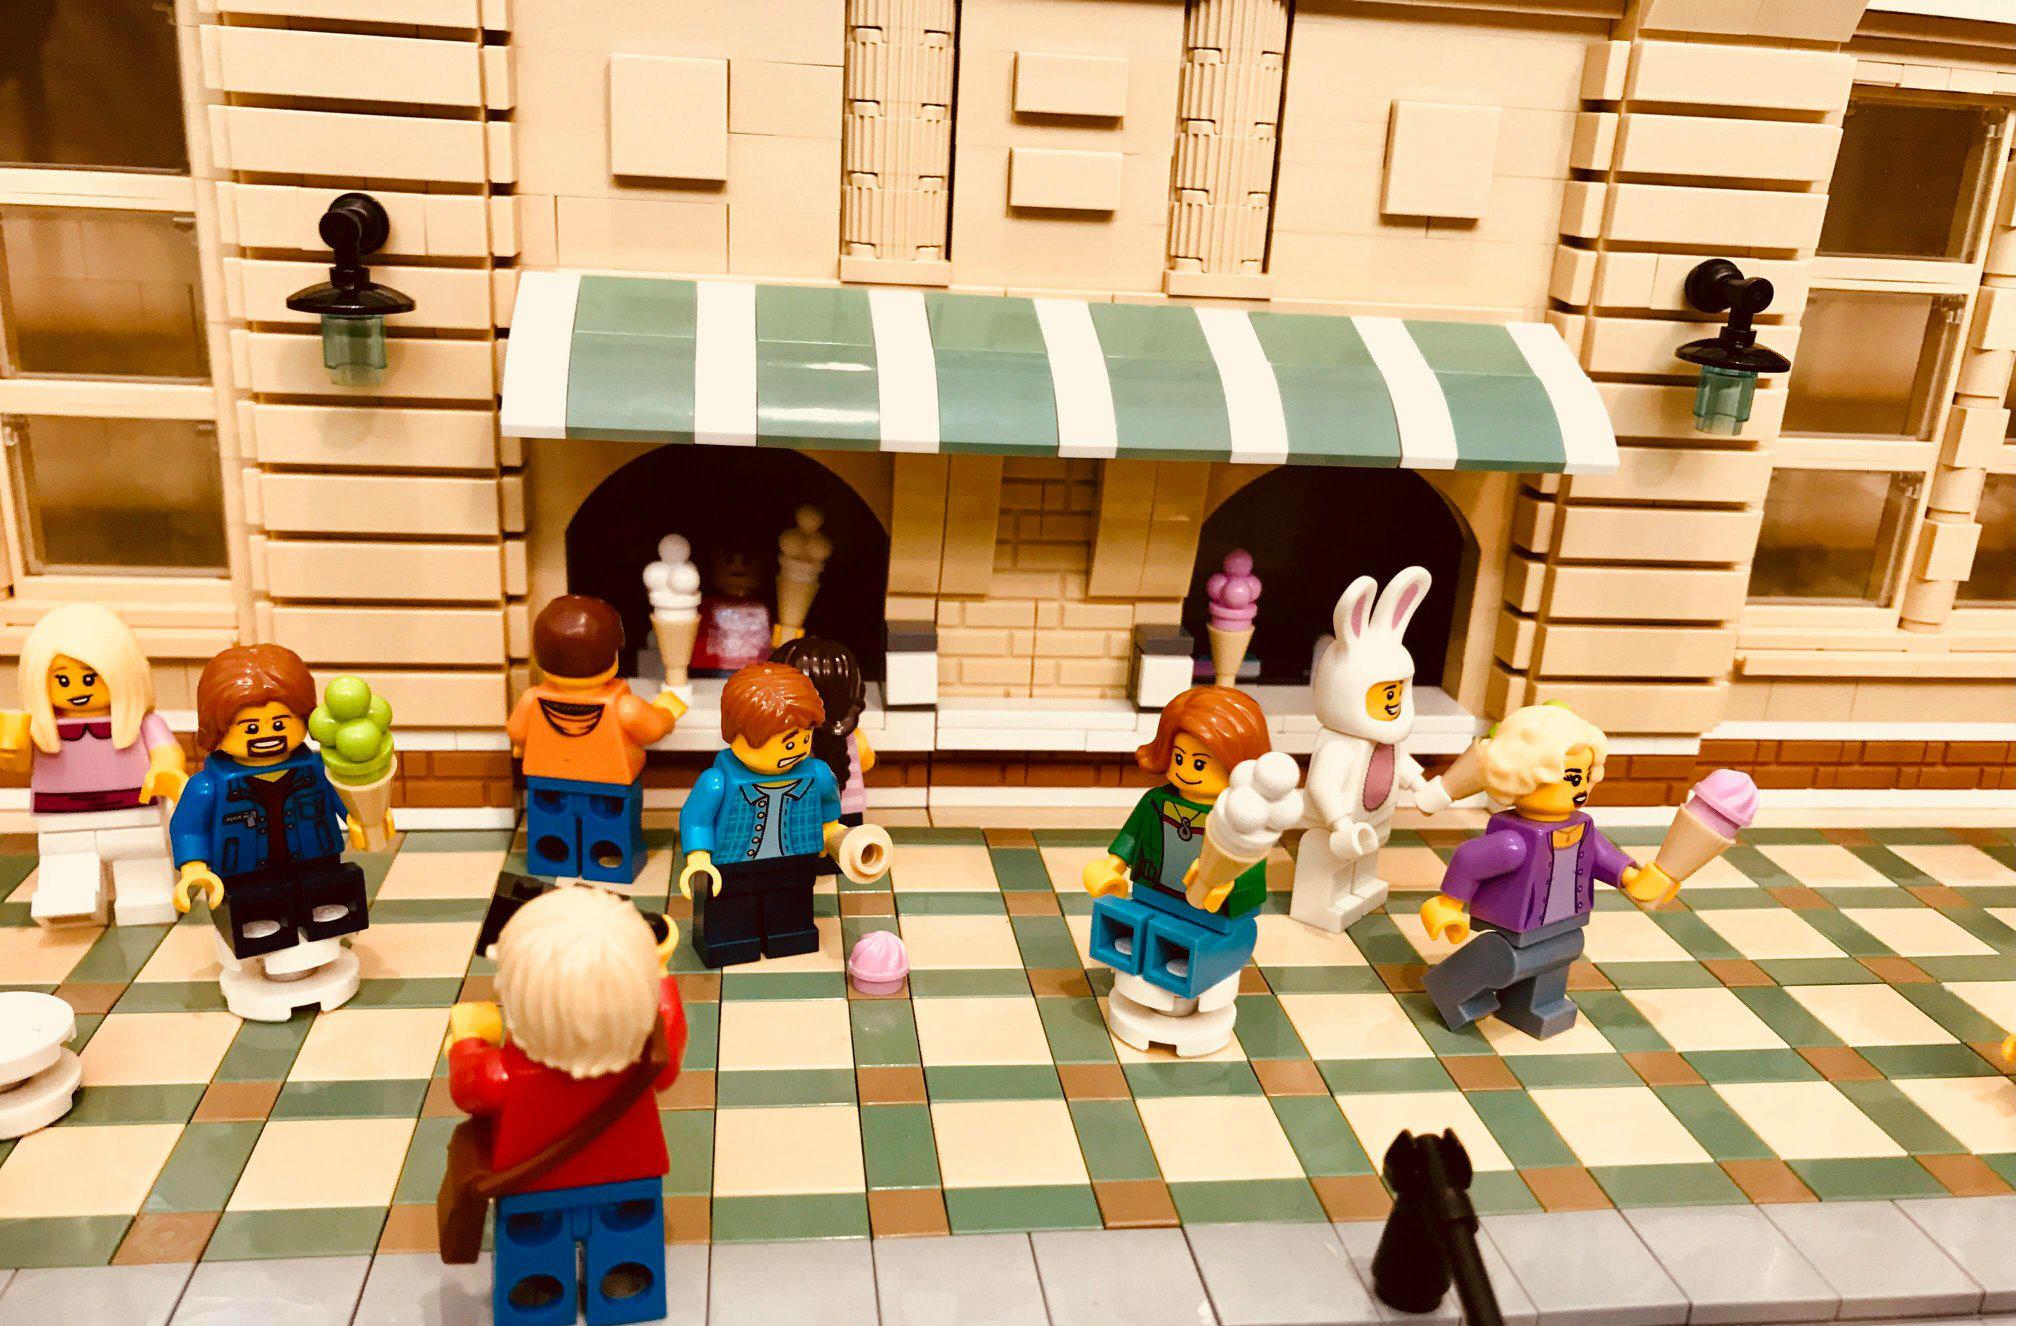 The Sydney Brick Show